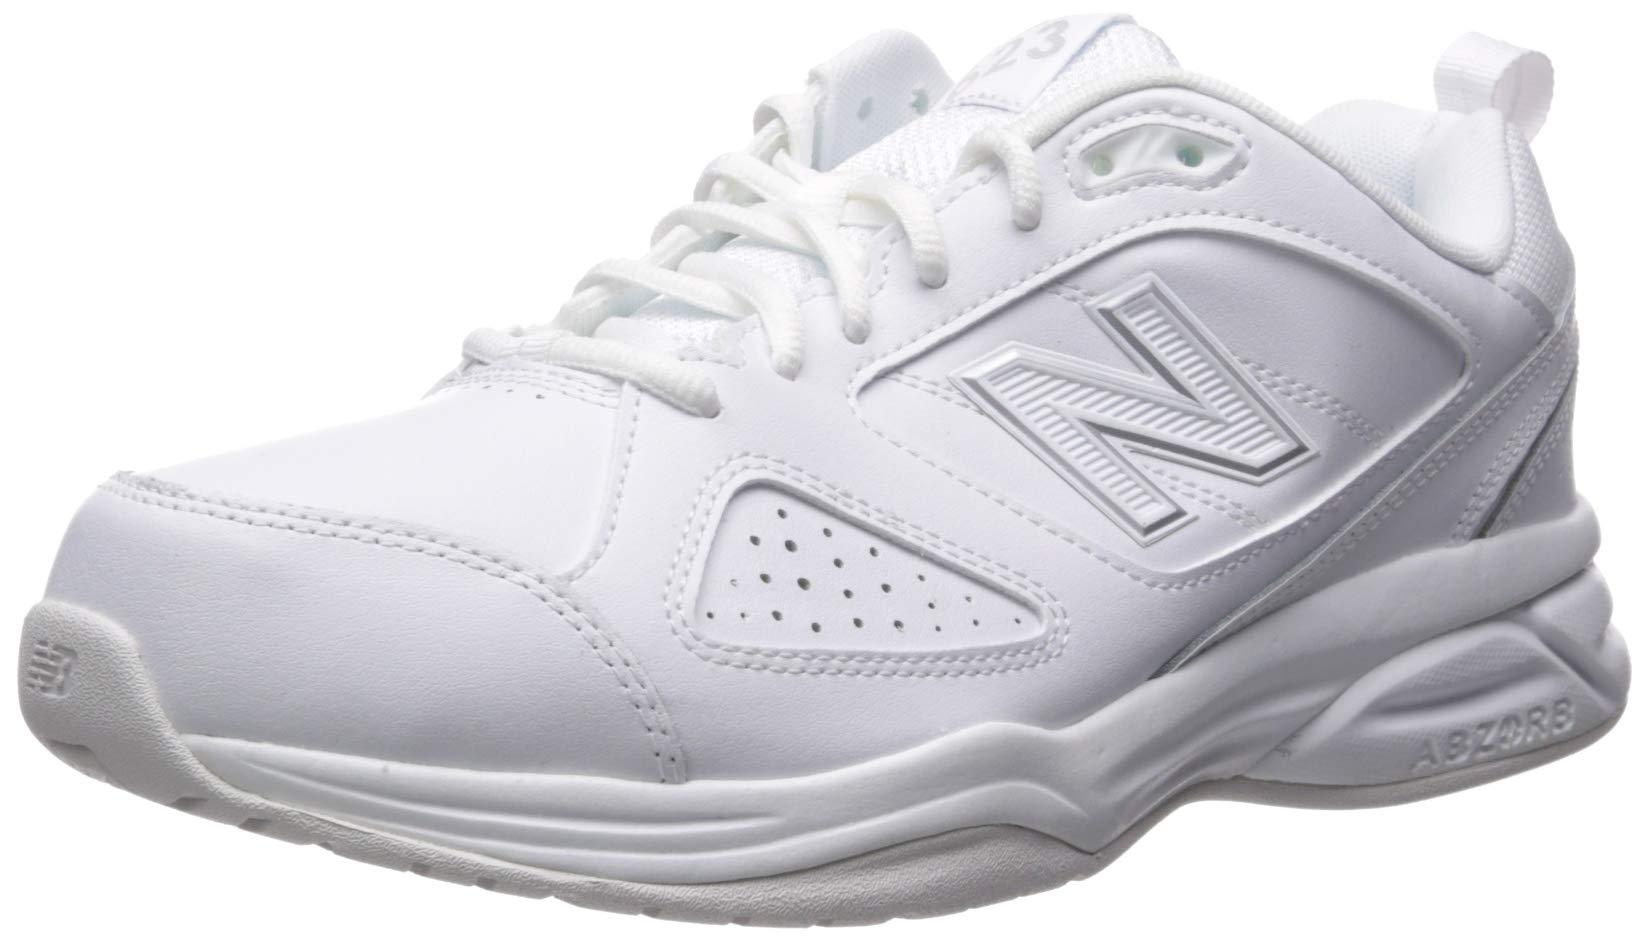 New Balance Women's 623v3 Comfort